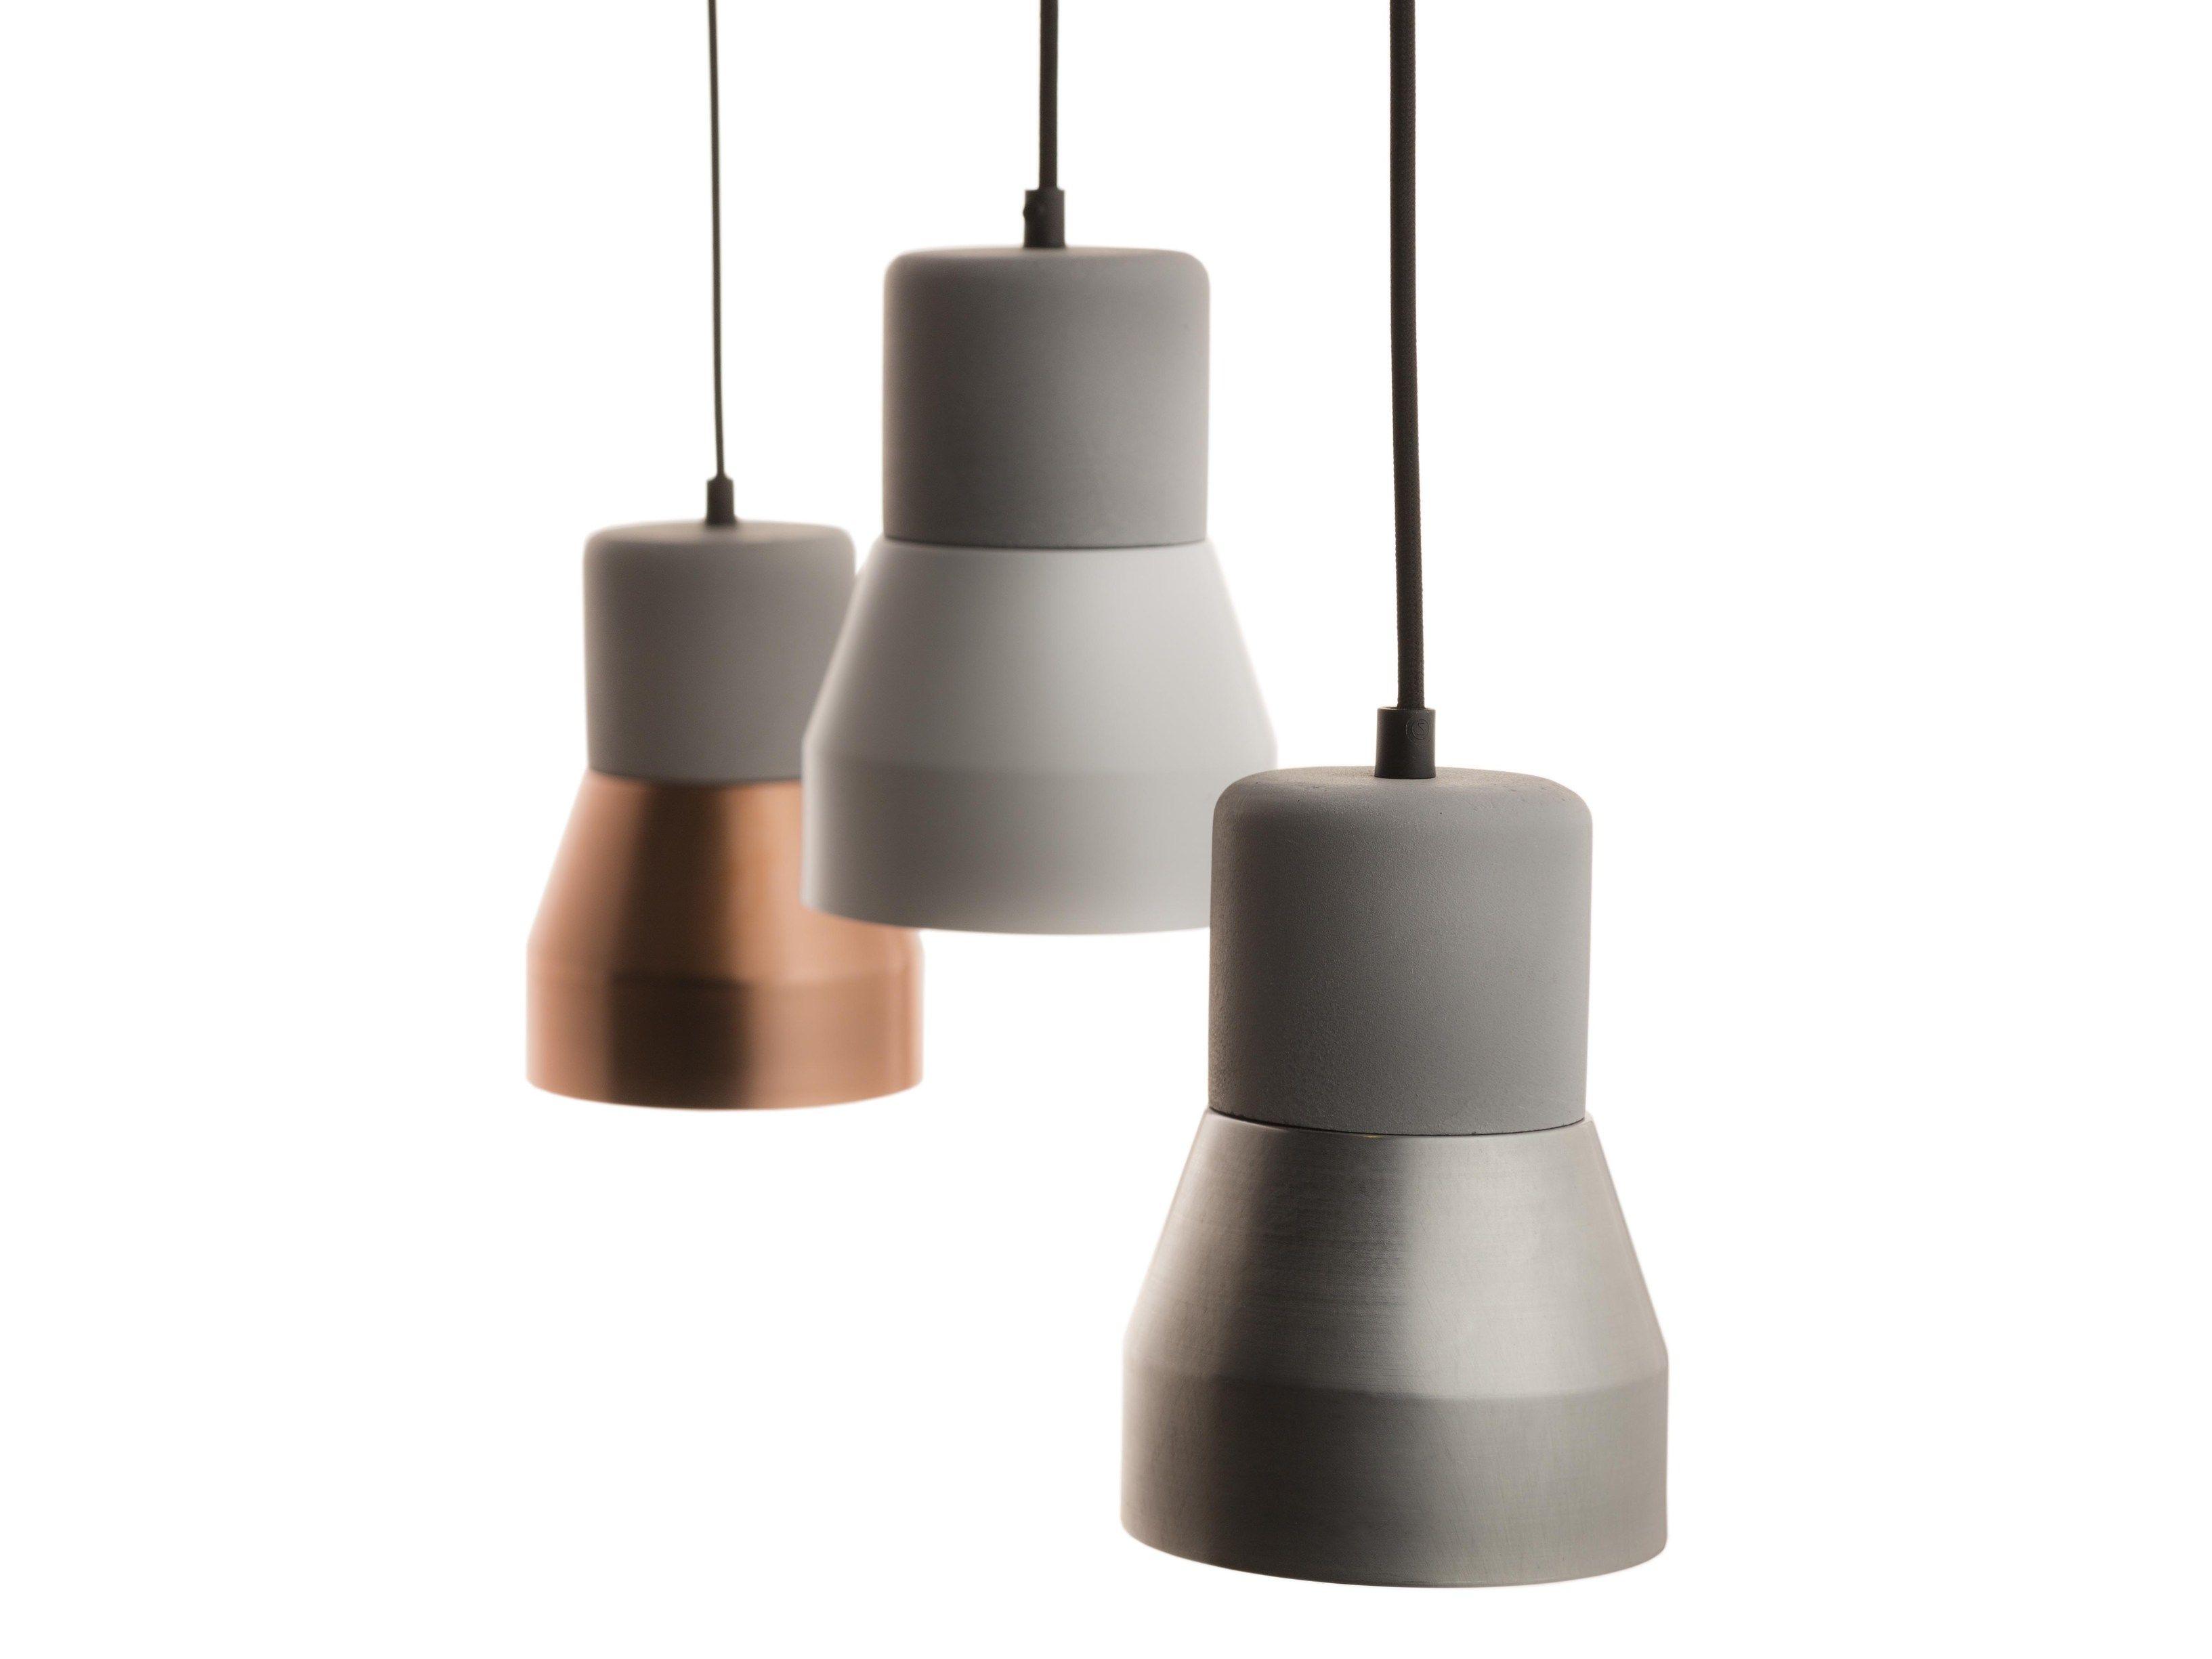 direct light pendant lamp steel wood lamp 130 mat by specimen editions design thinkk studio. Black Bedroom Furniture Sets. Home Design Ideas